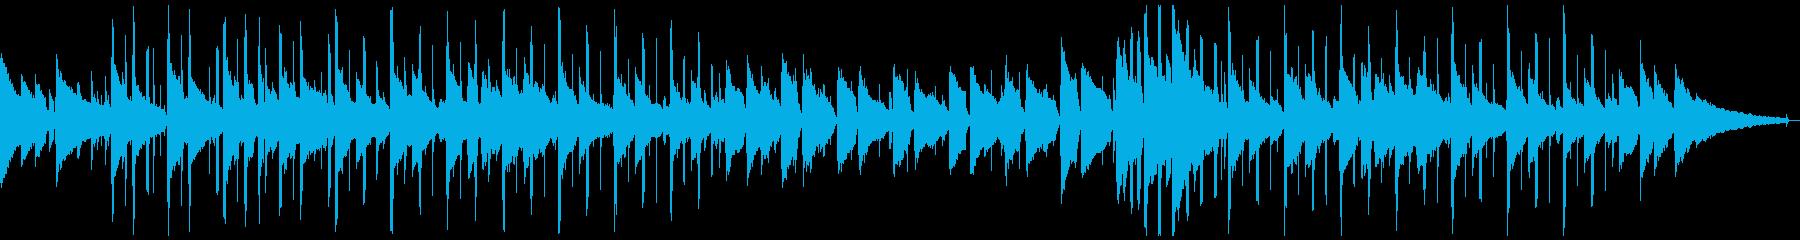 BGM シリアス・静けさのある場面の再生済みの波形